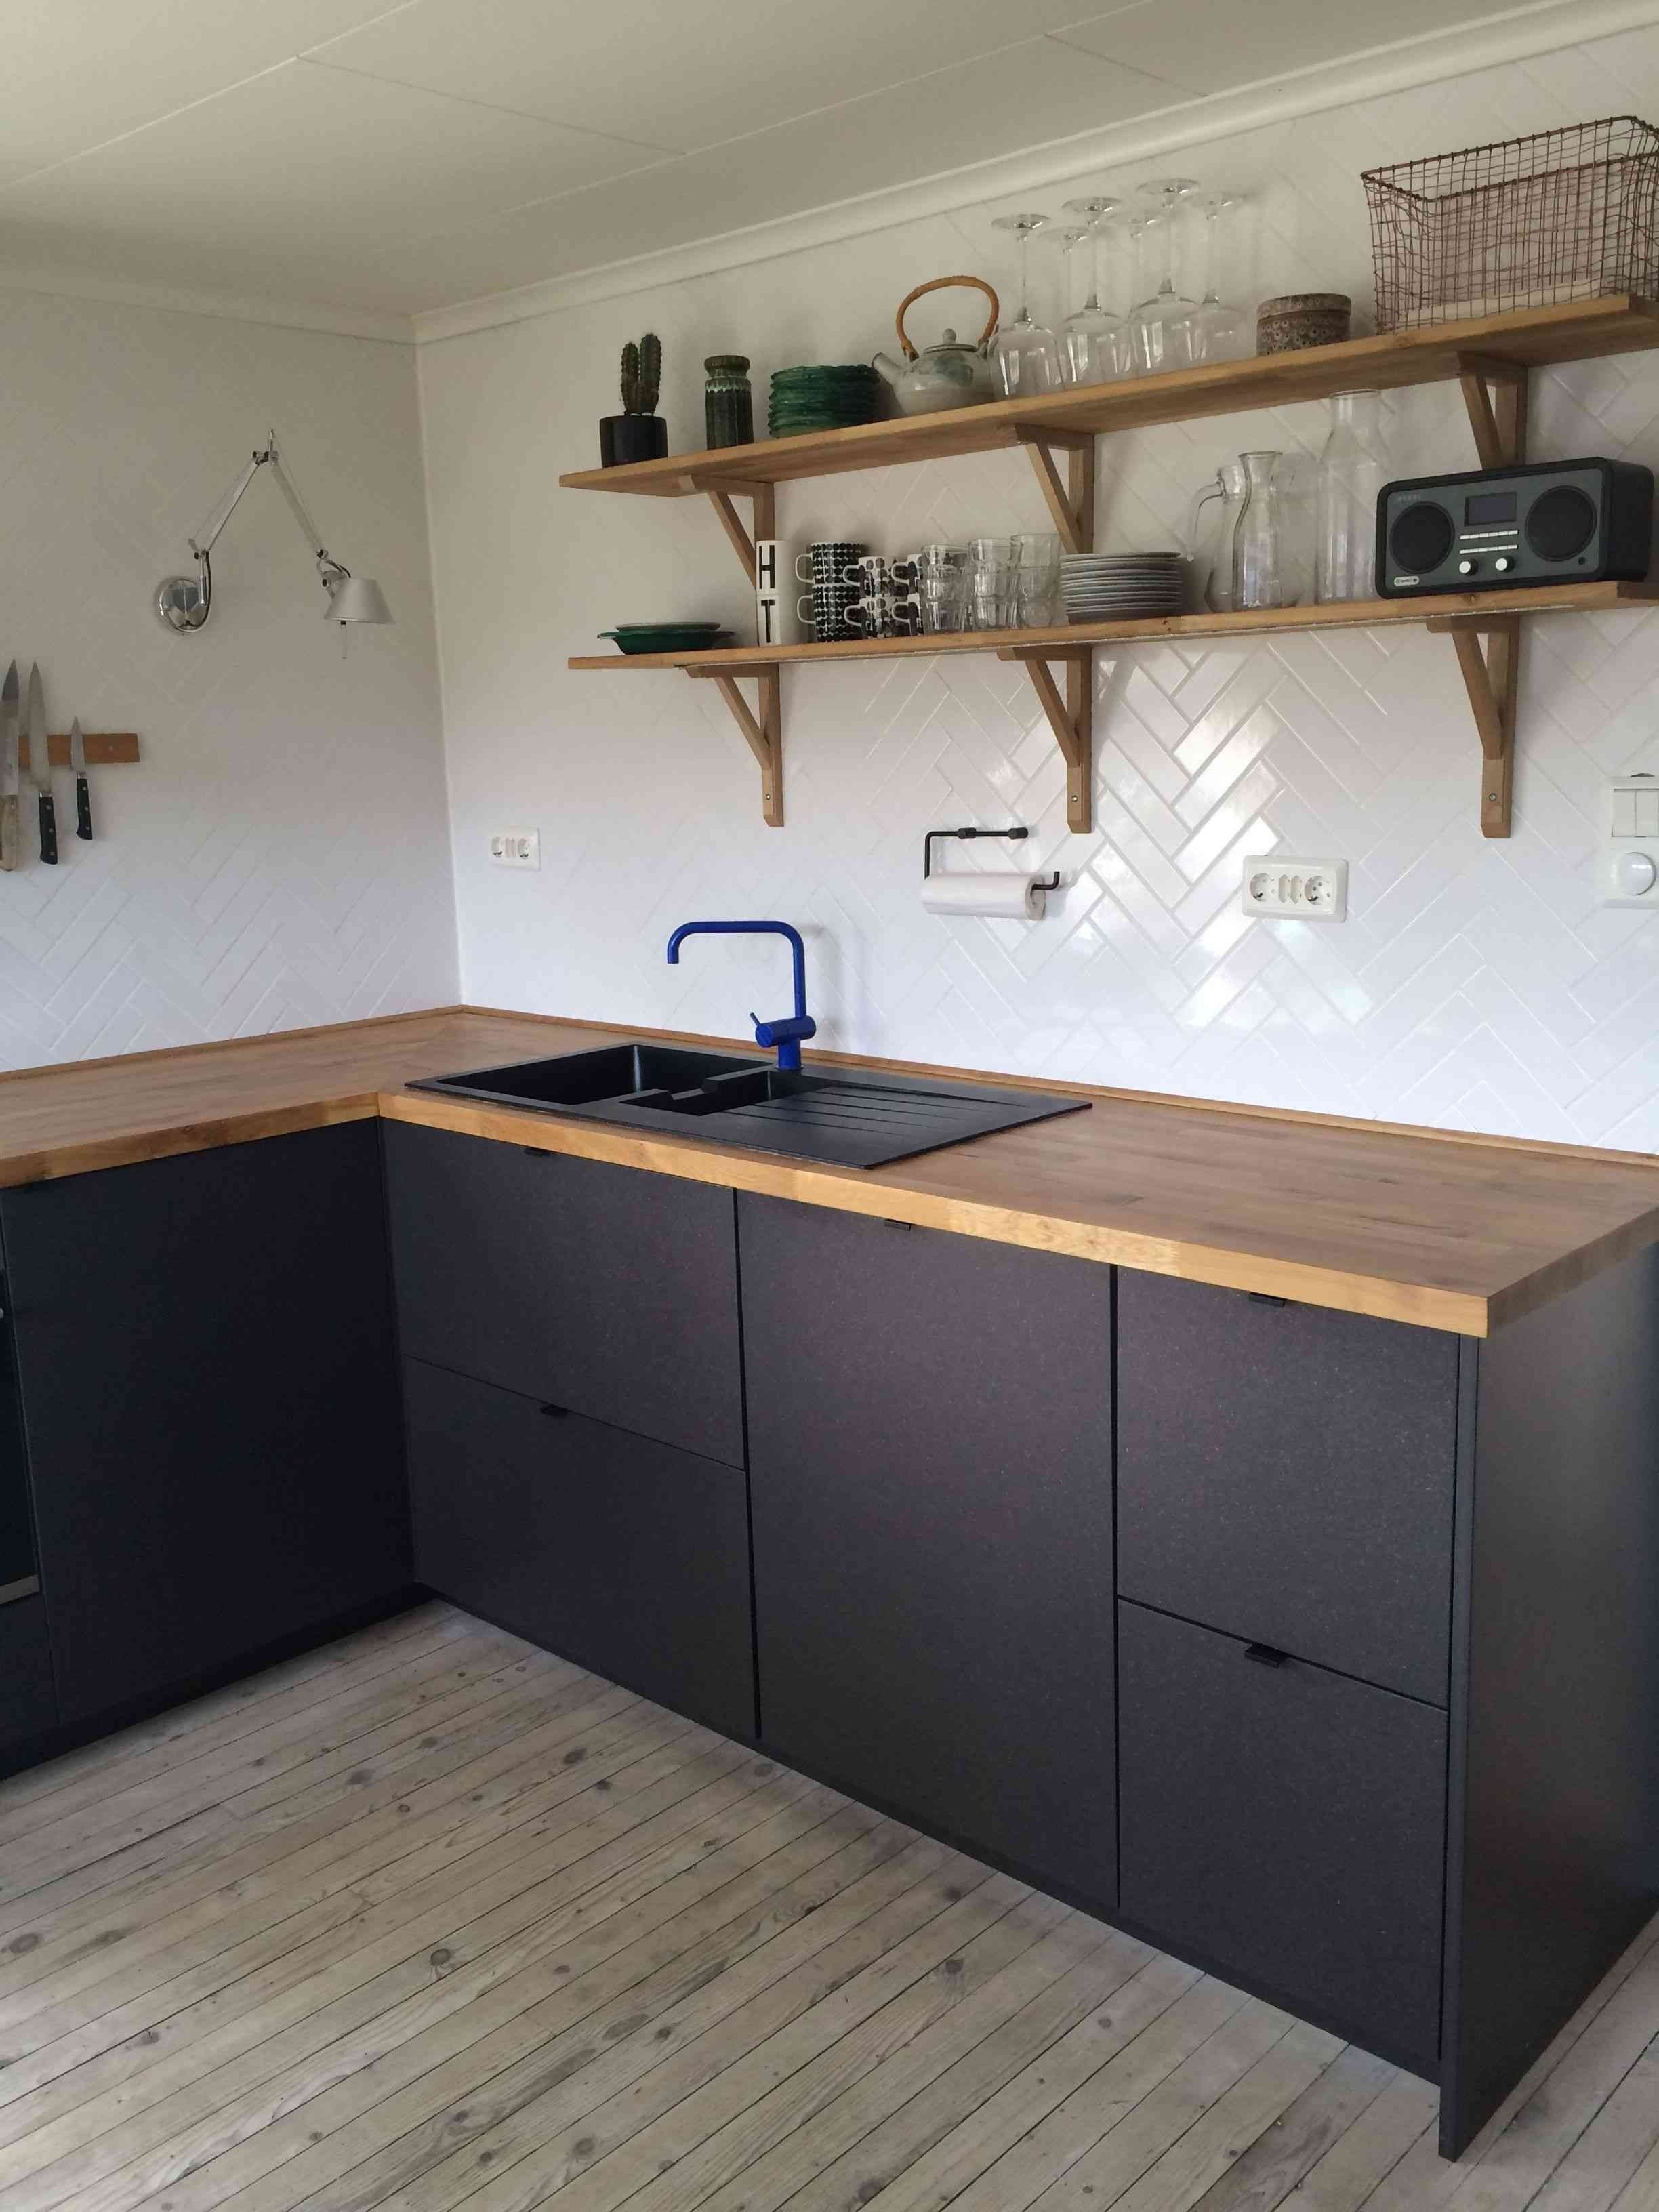 Best Of Ikea Toulon Cuisine Ikea Kitchen Design Wood Kitchen